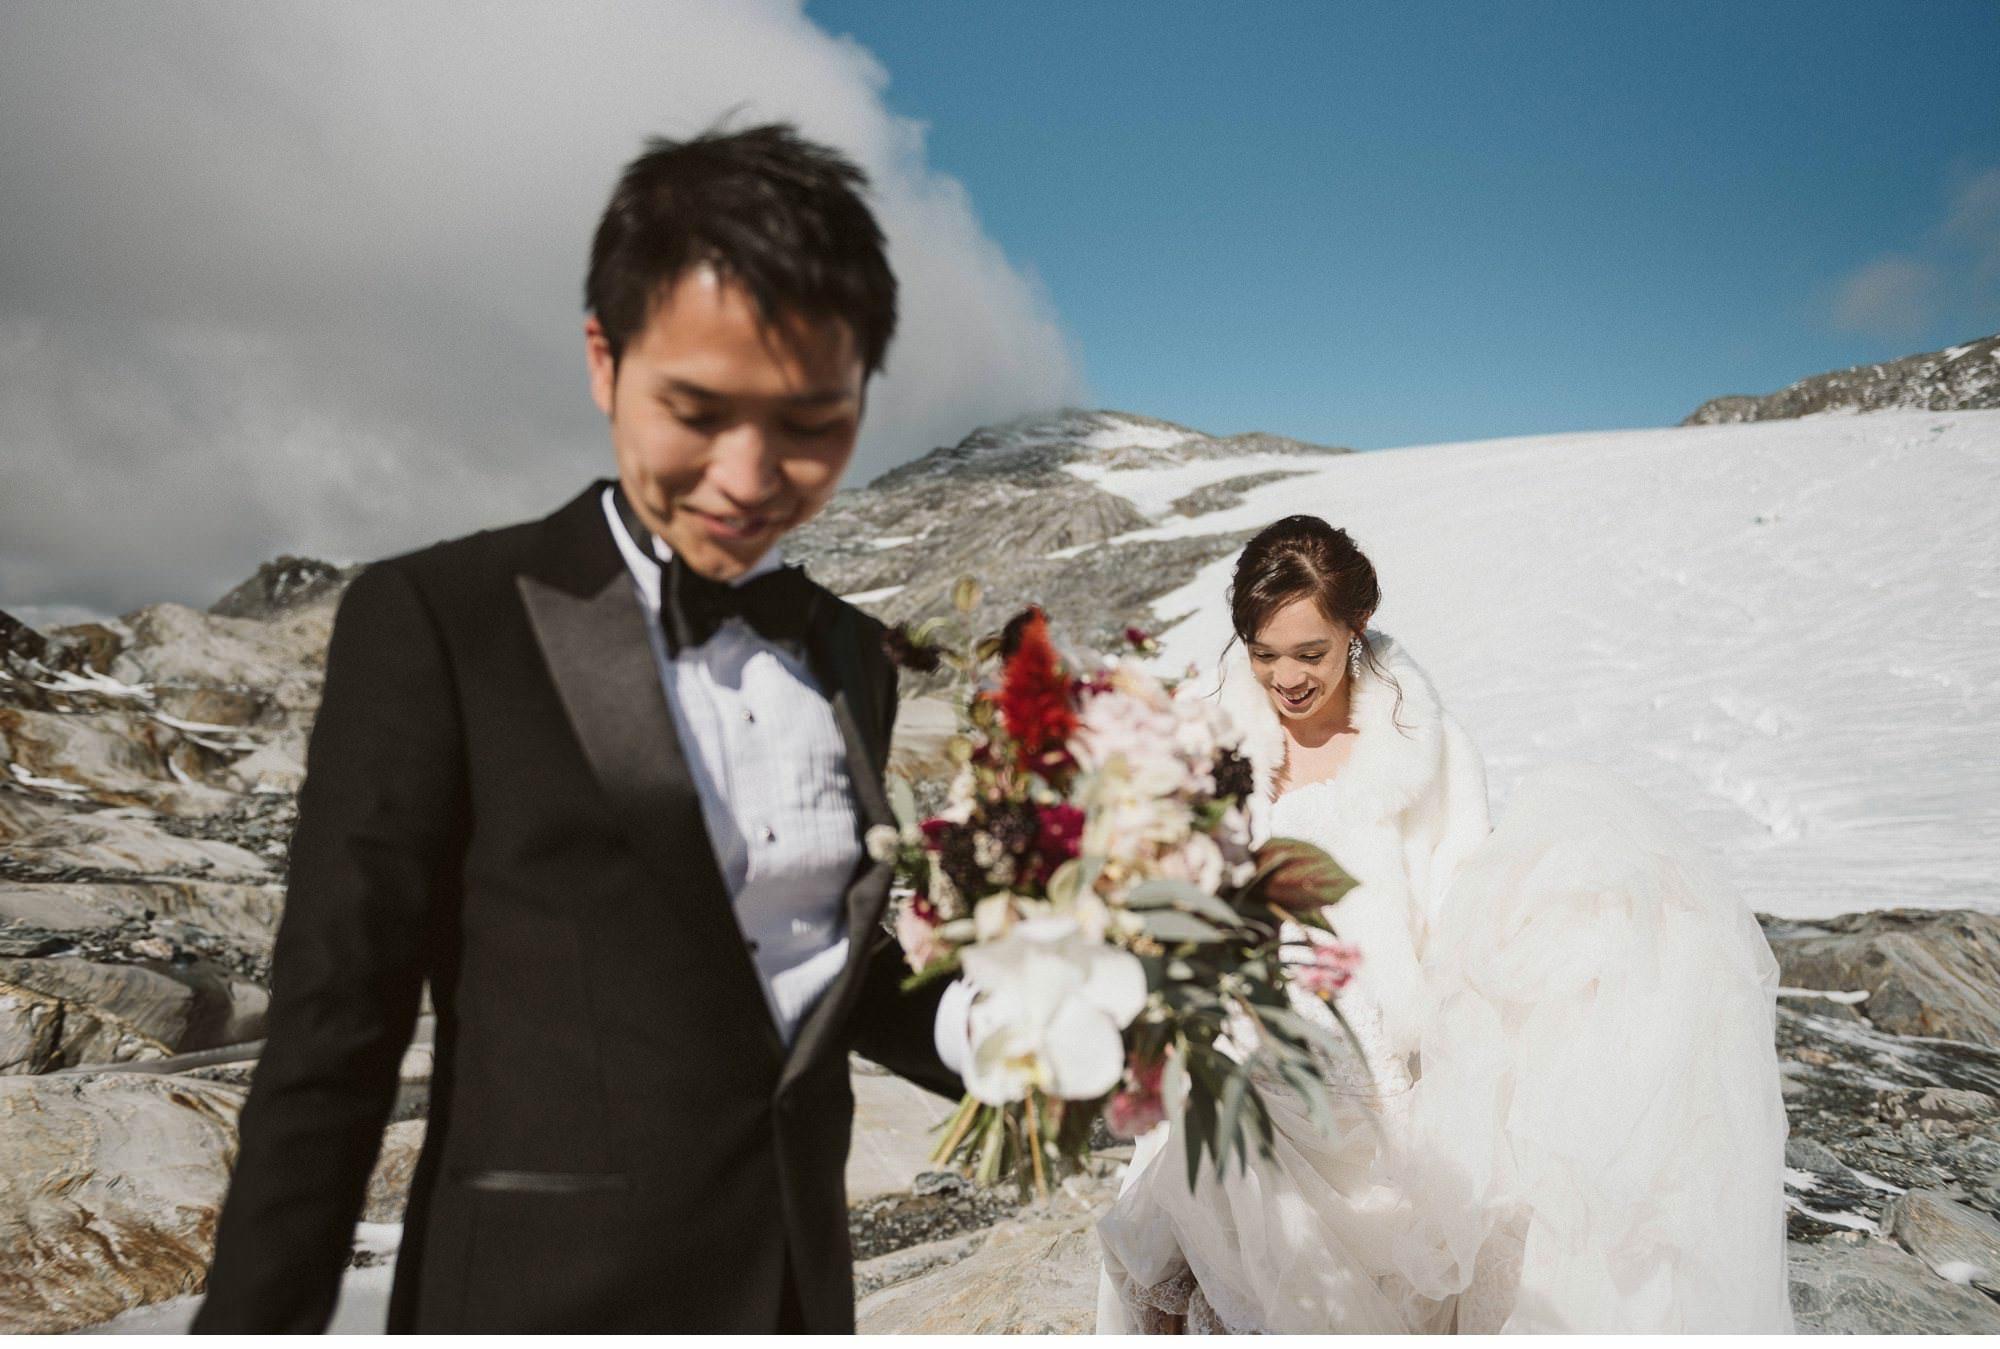 Isobel Glacier Pre Wedding Photography-020.jpg